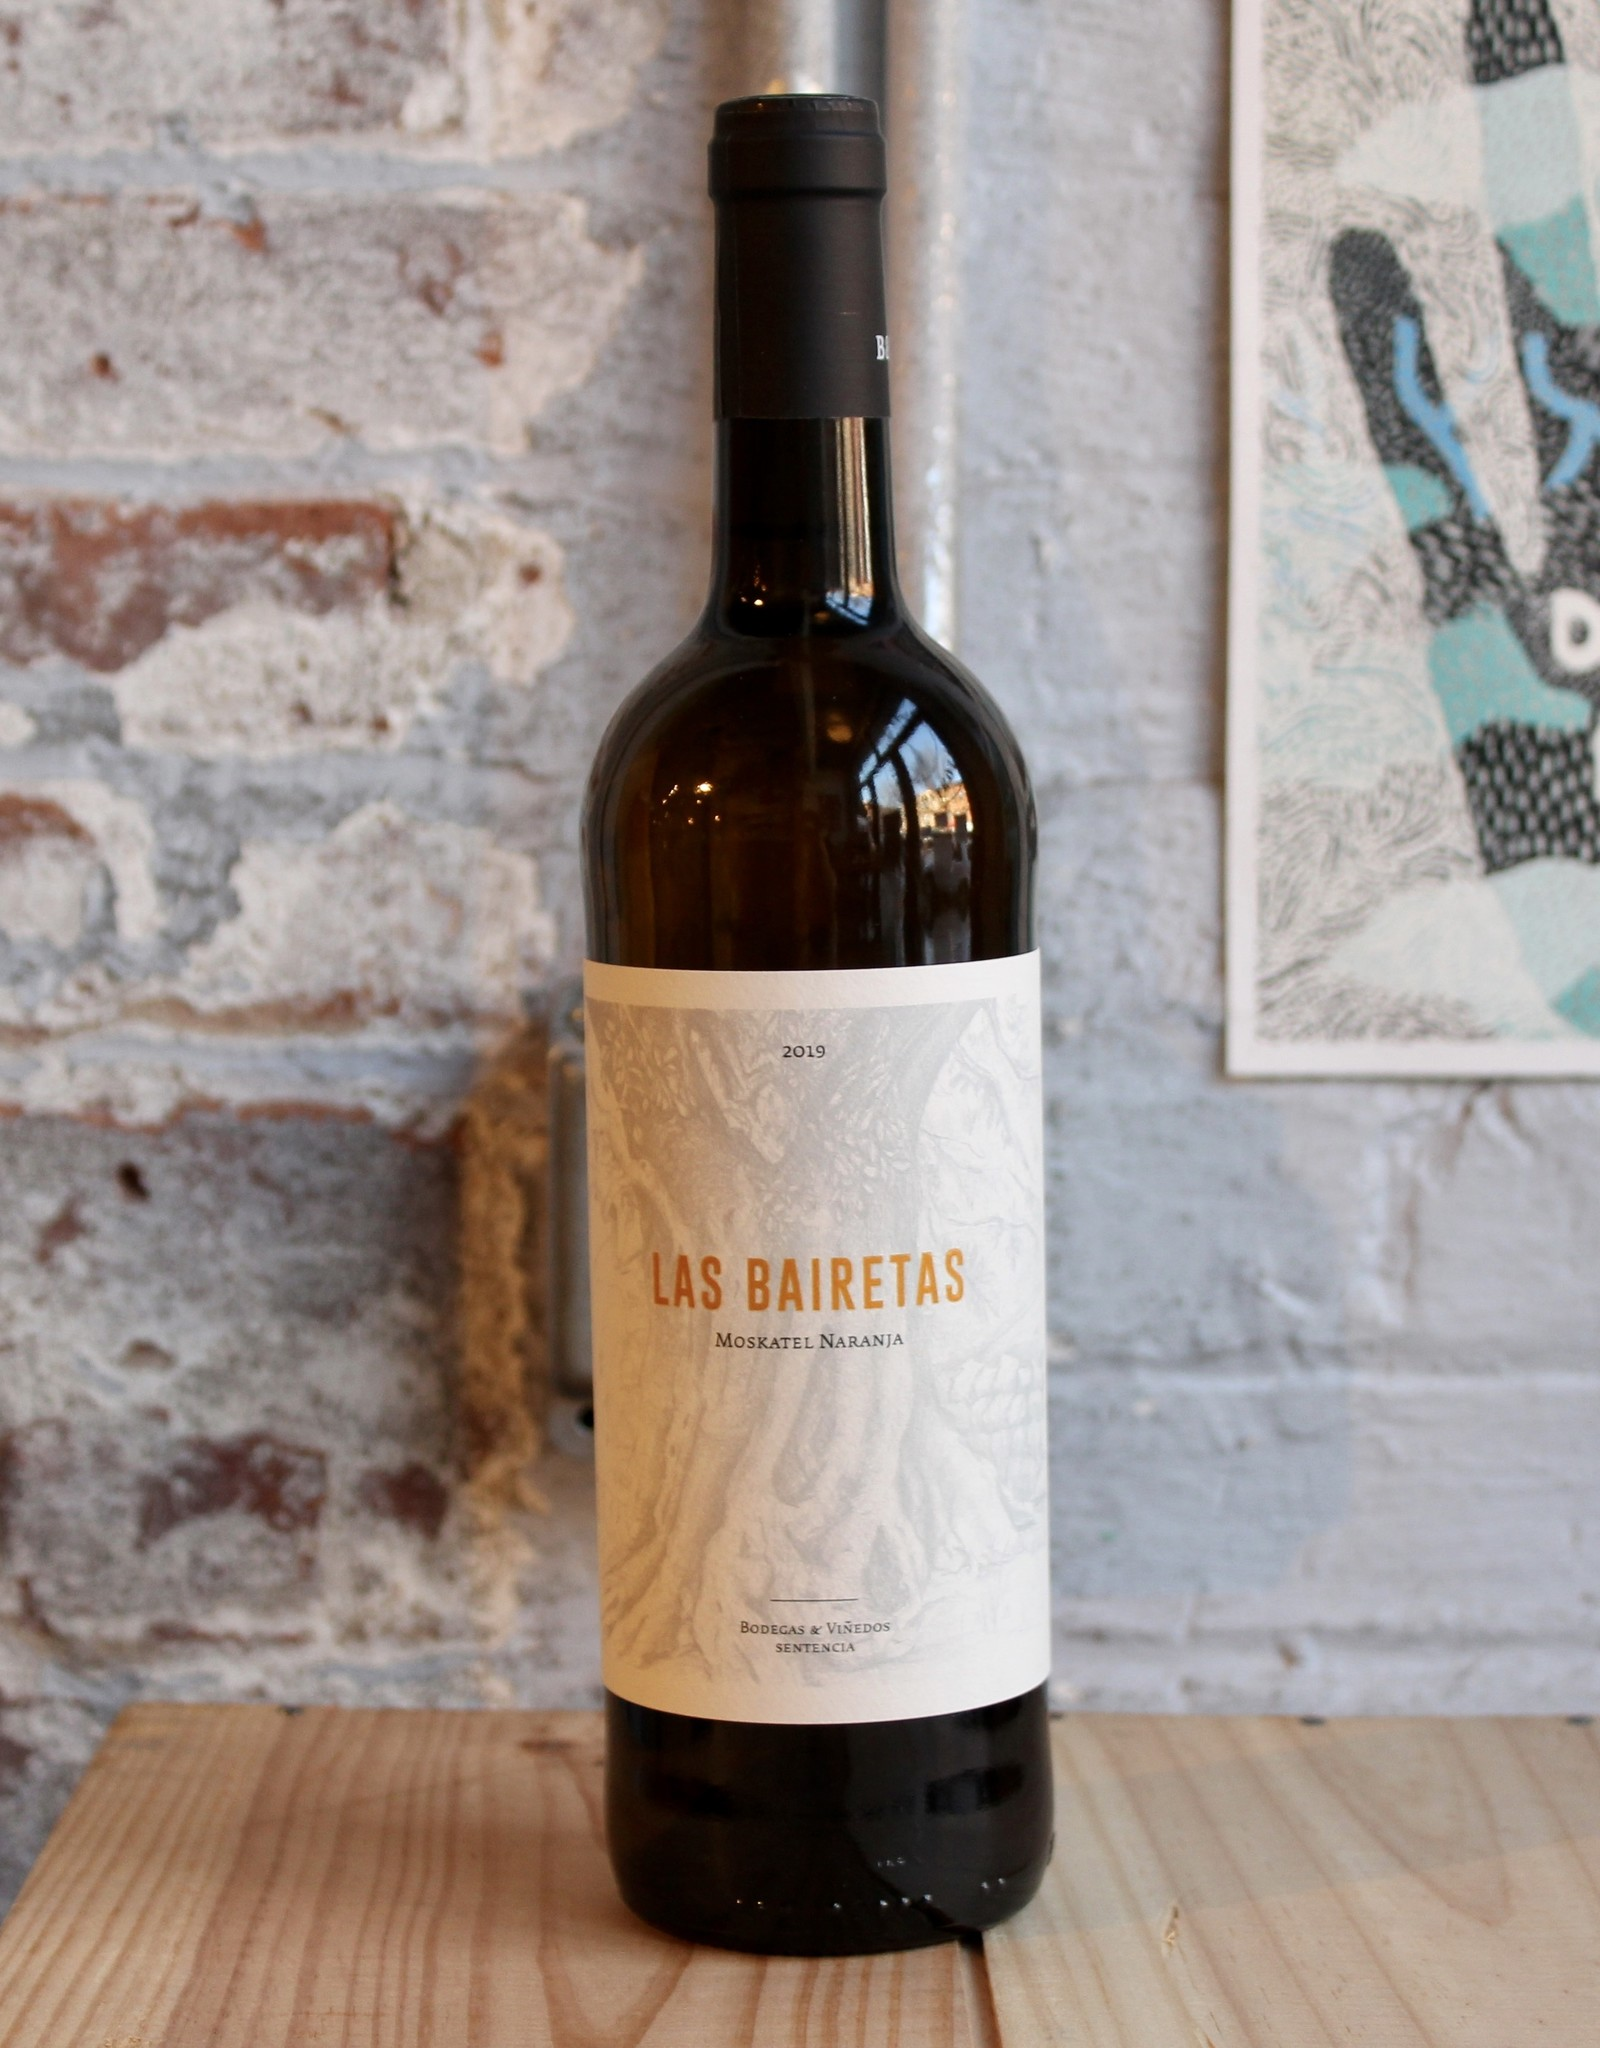 Wine 2019 Bodegas Sentencia Las Bairetas Moskatel Naranja Skin-Contact - Valencia, Spain (750ml)